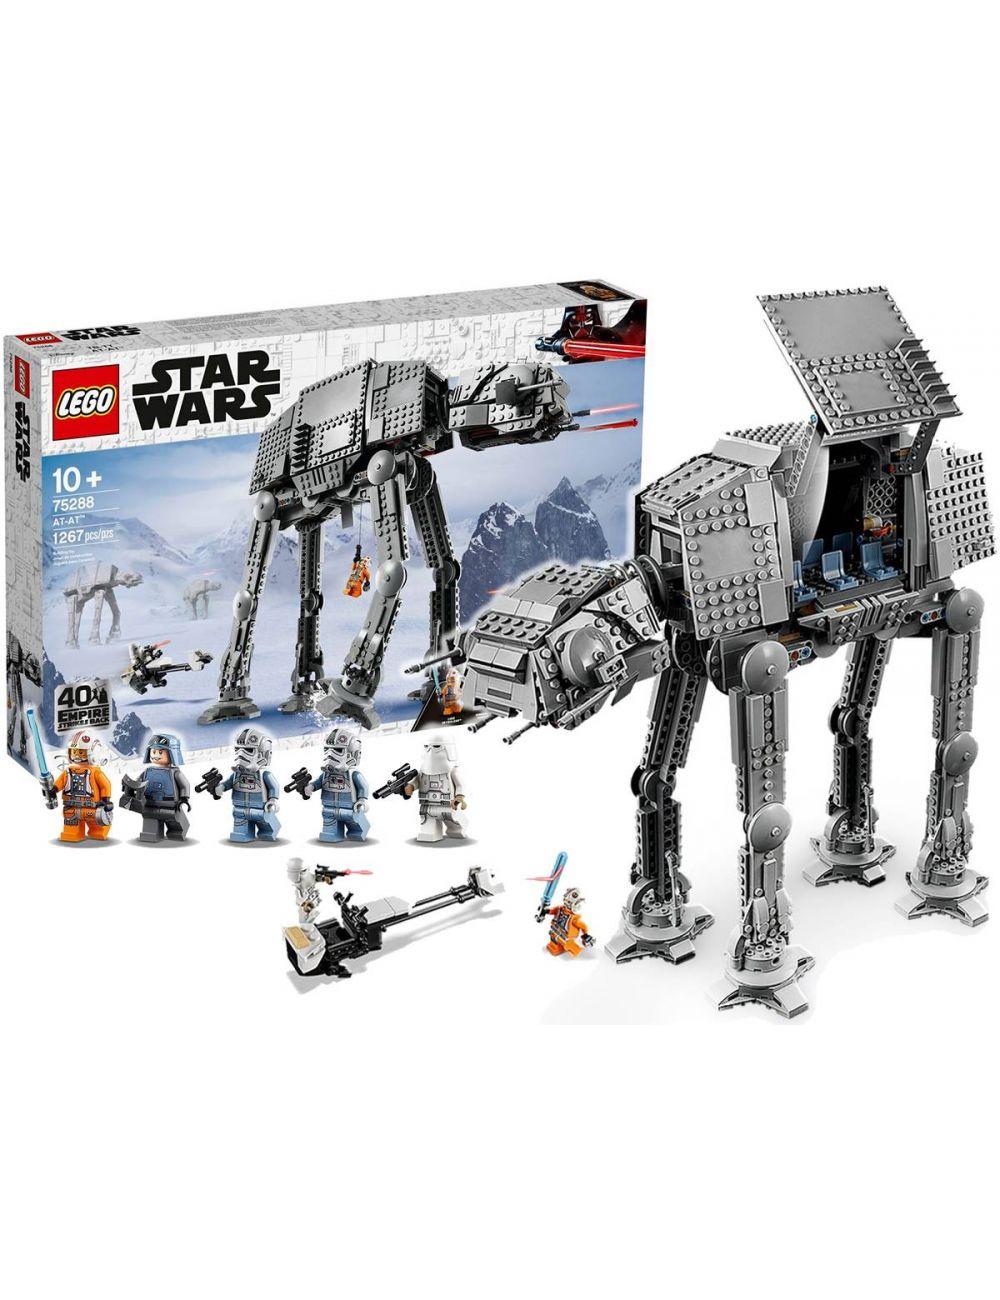 LEGO Star Wars AT-AT Zestaw Klocki 75288